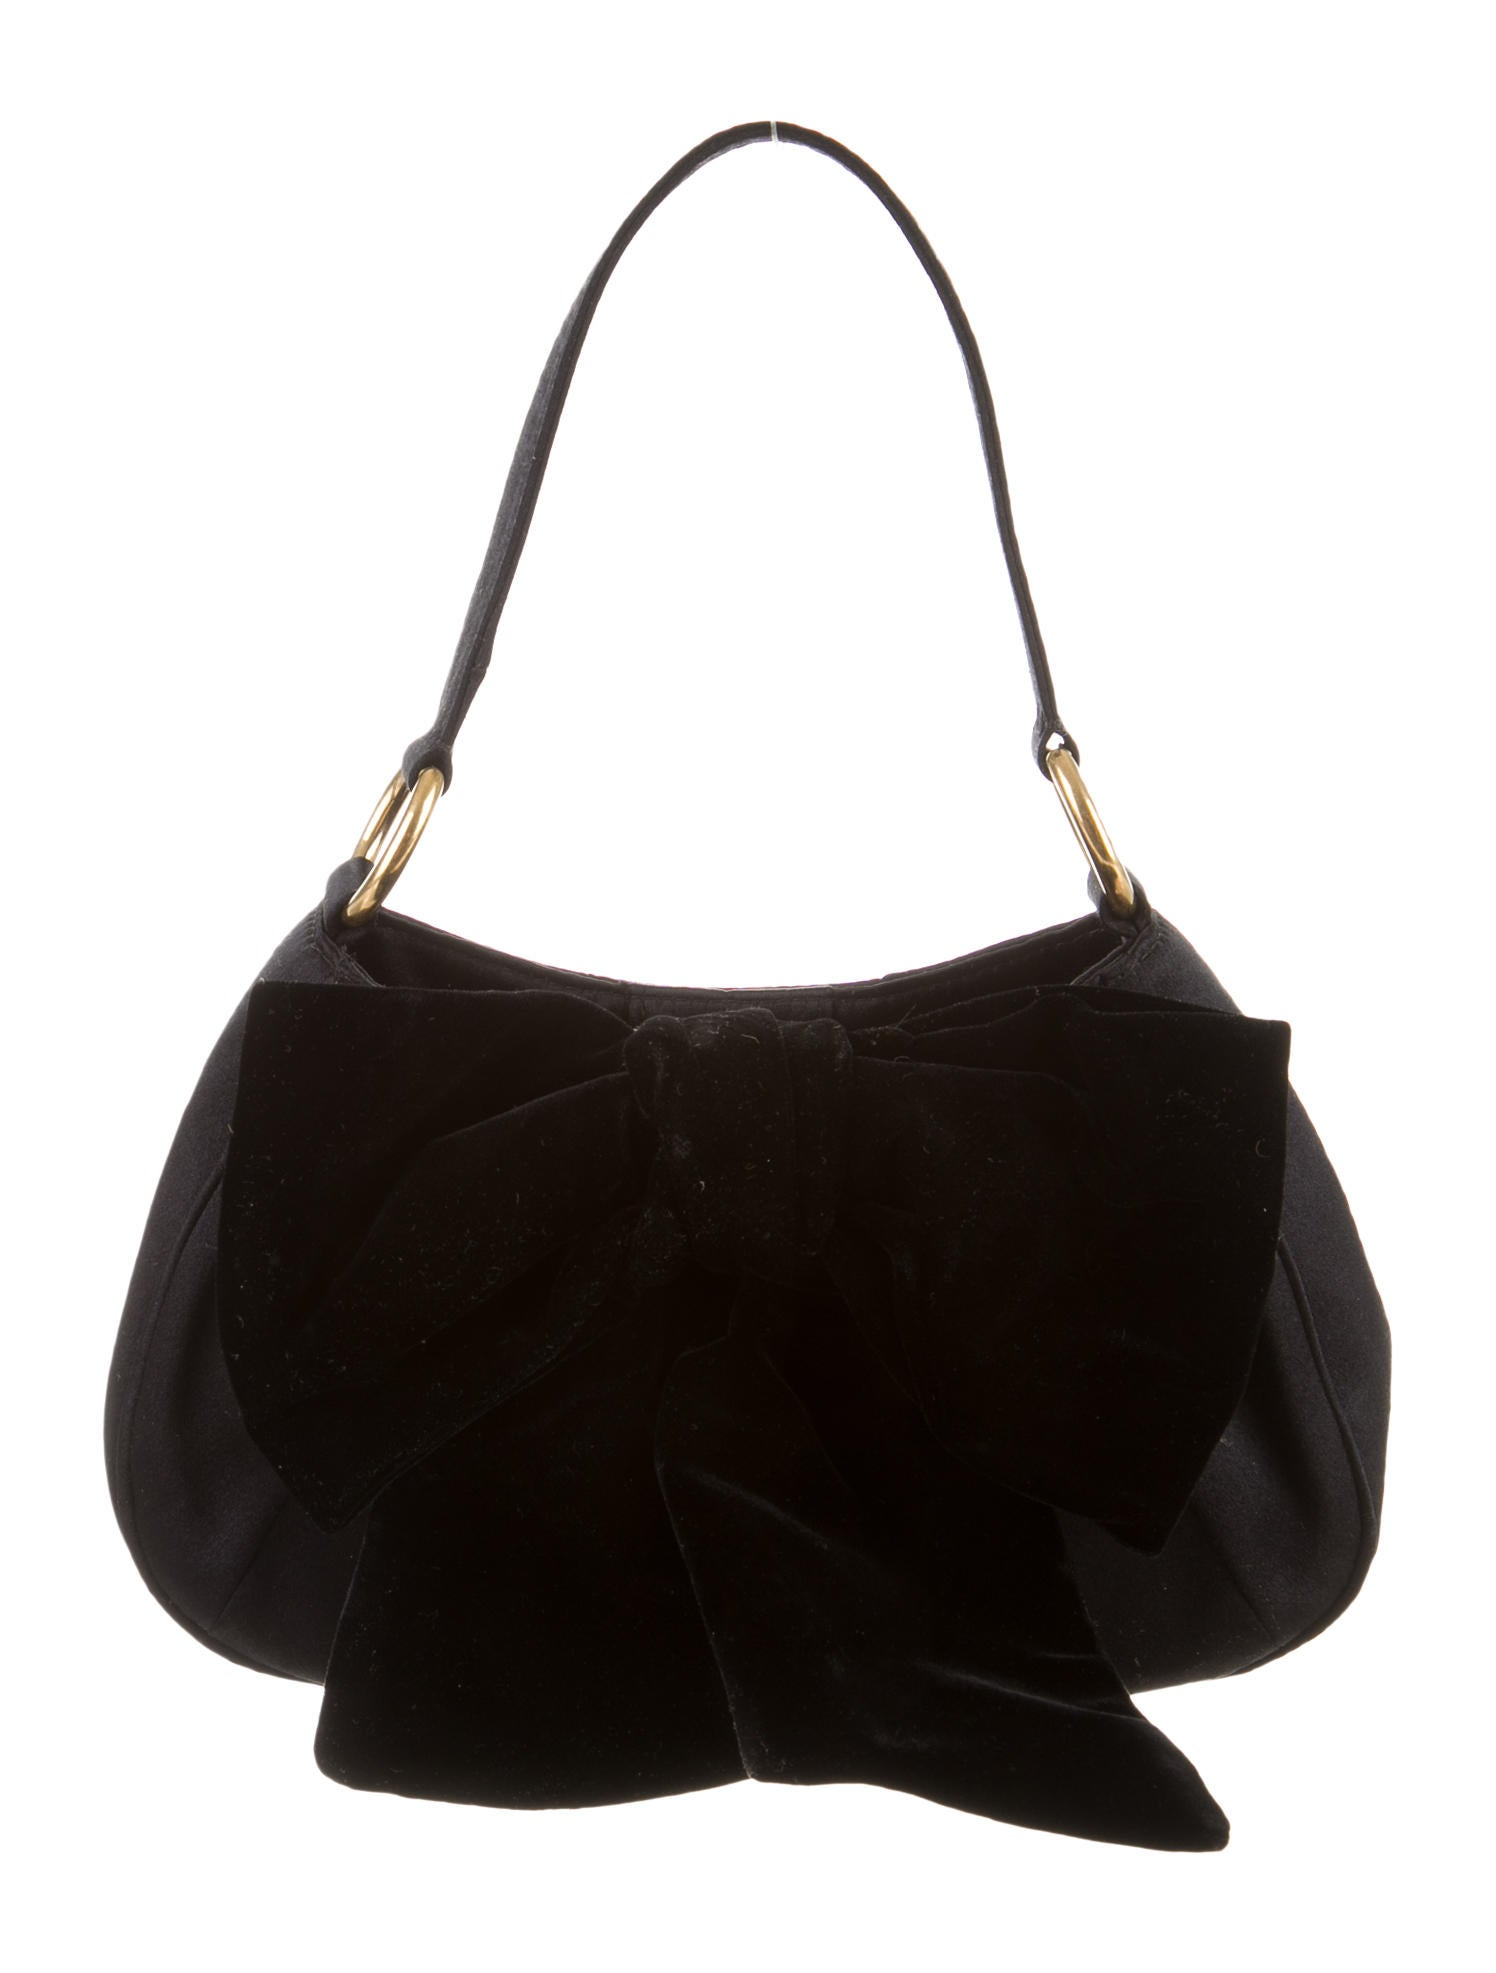 yves st laren - yves saint laurent bow handle bag, yve saint laurent bag